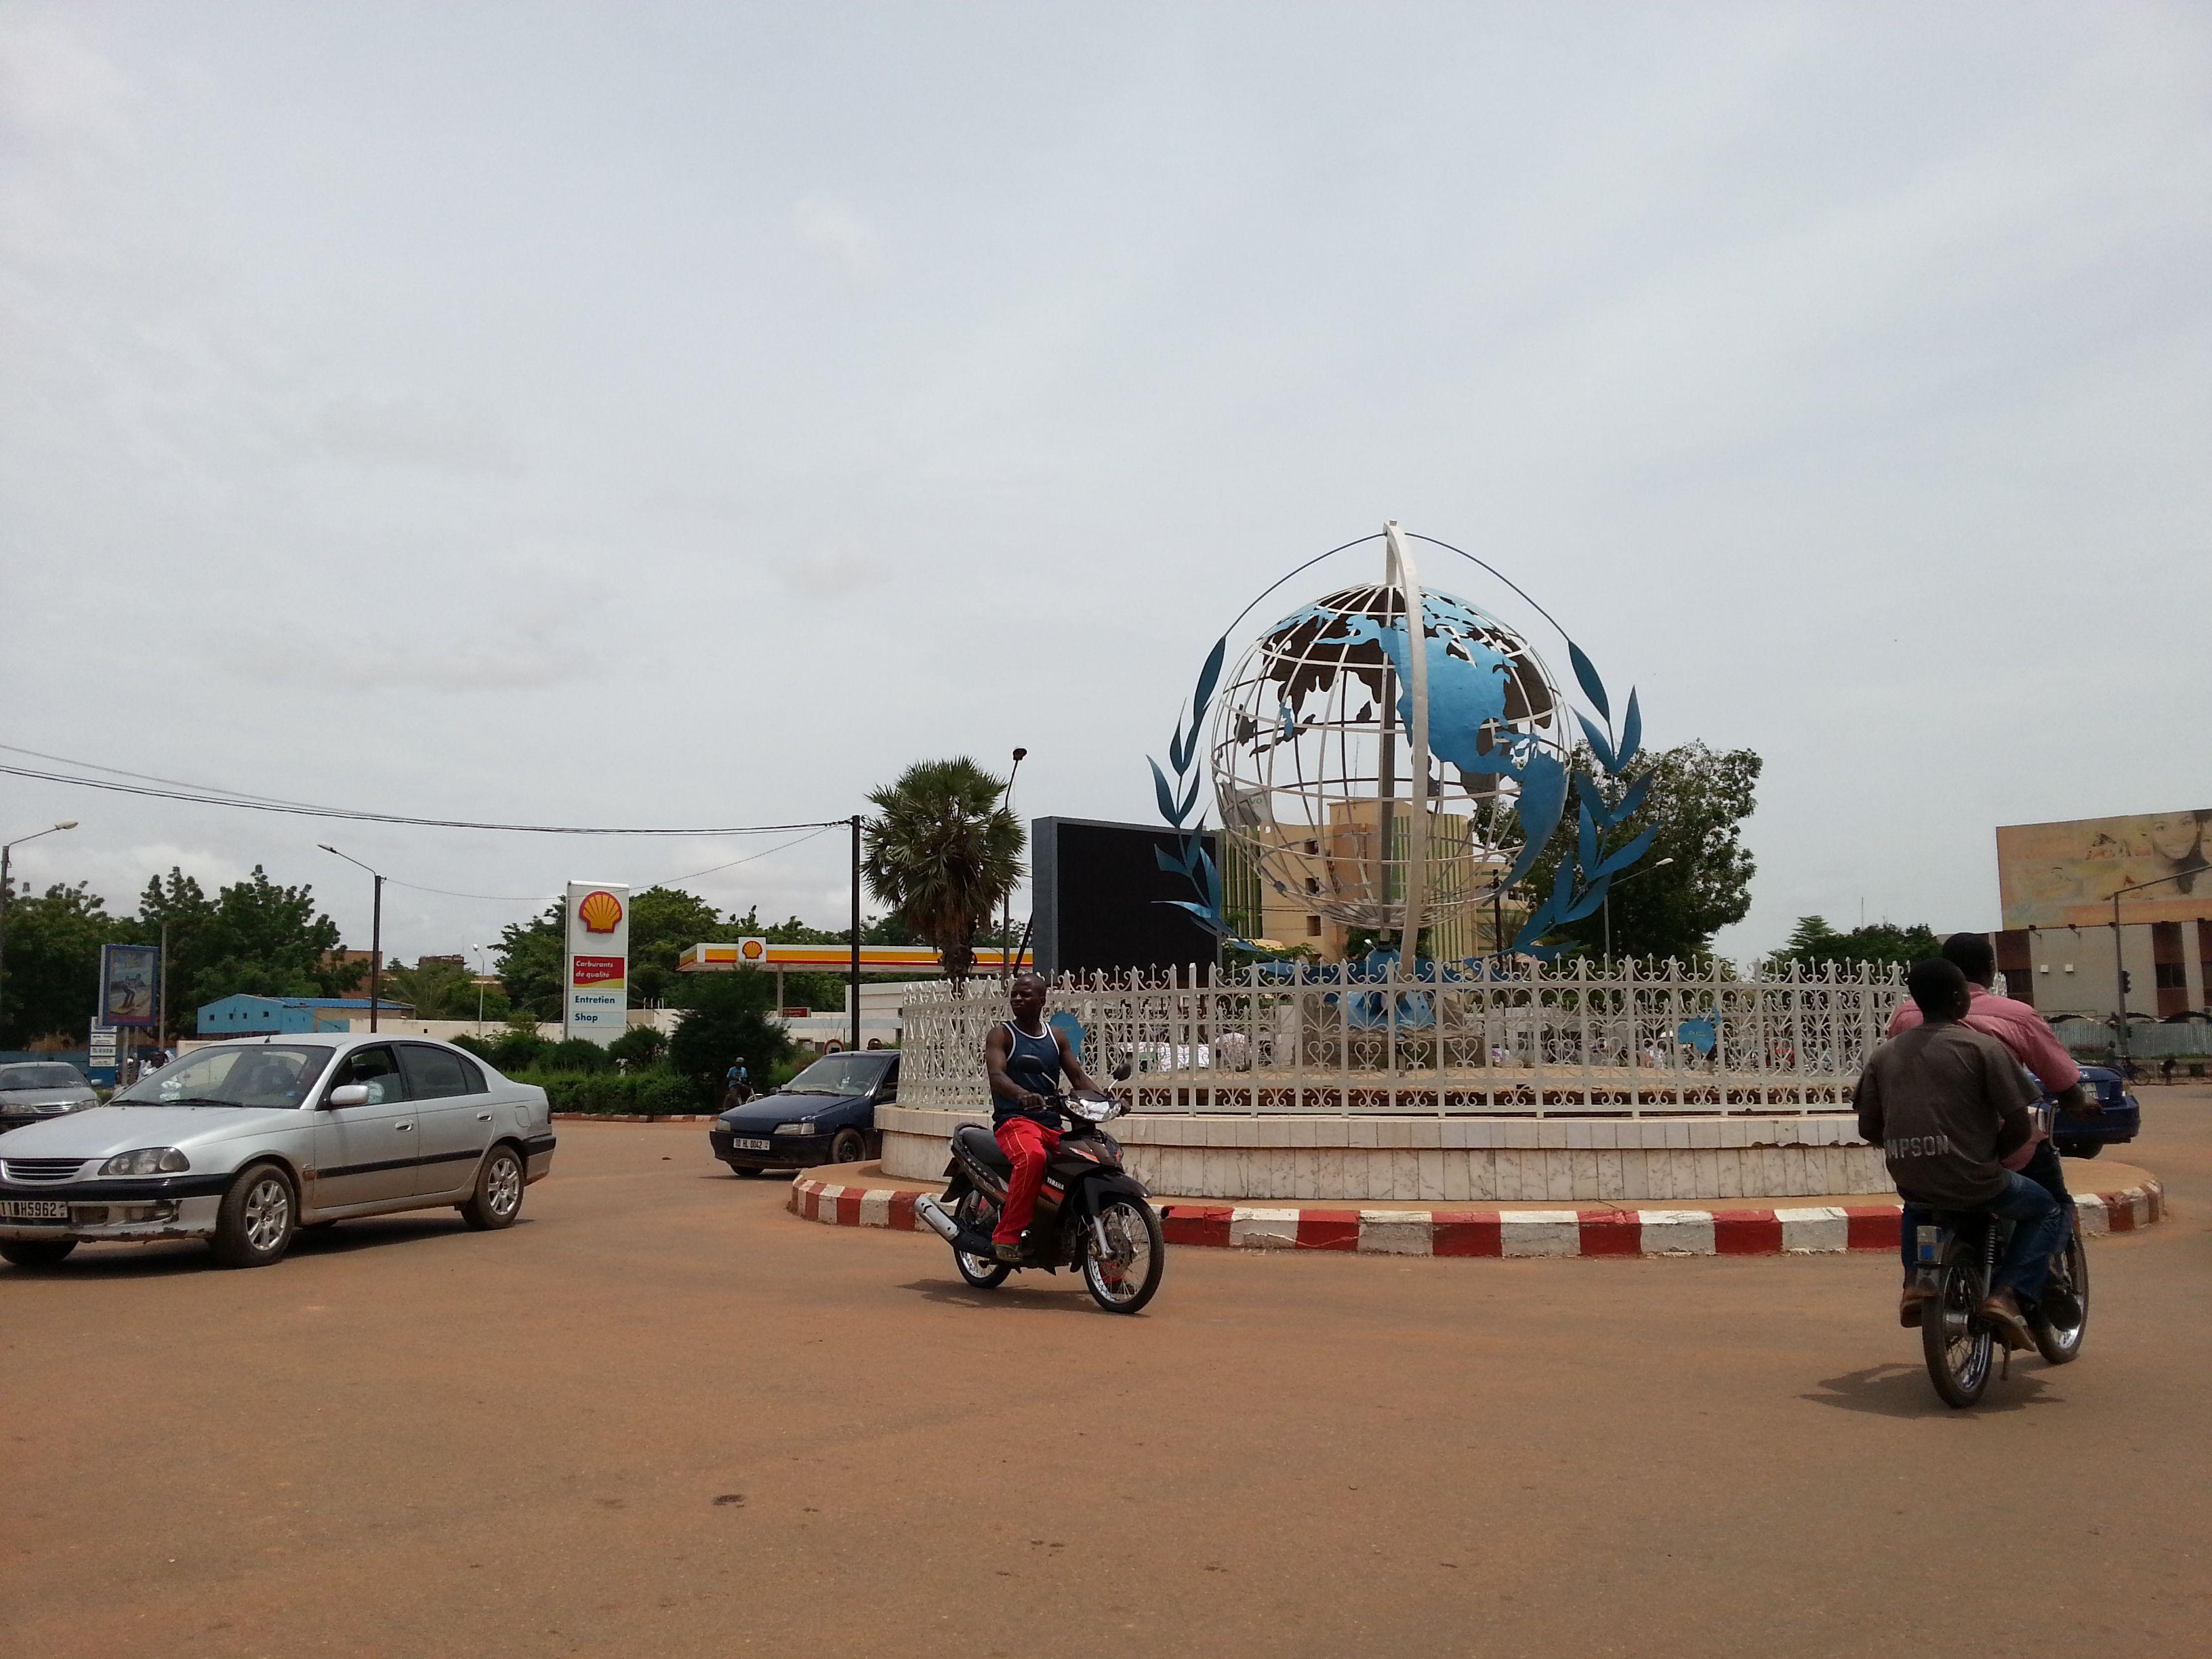 Le Rond Point Des Nations Unies A Ouagadougou Burkina Faso 2013 Rond Point